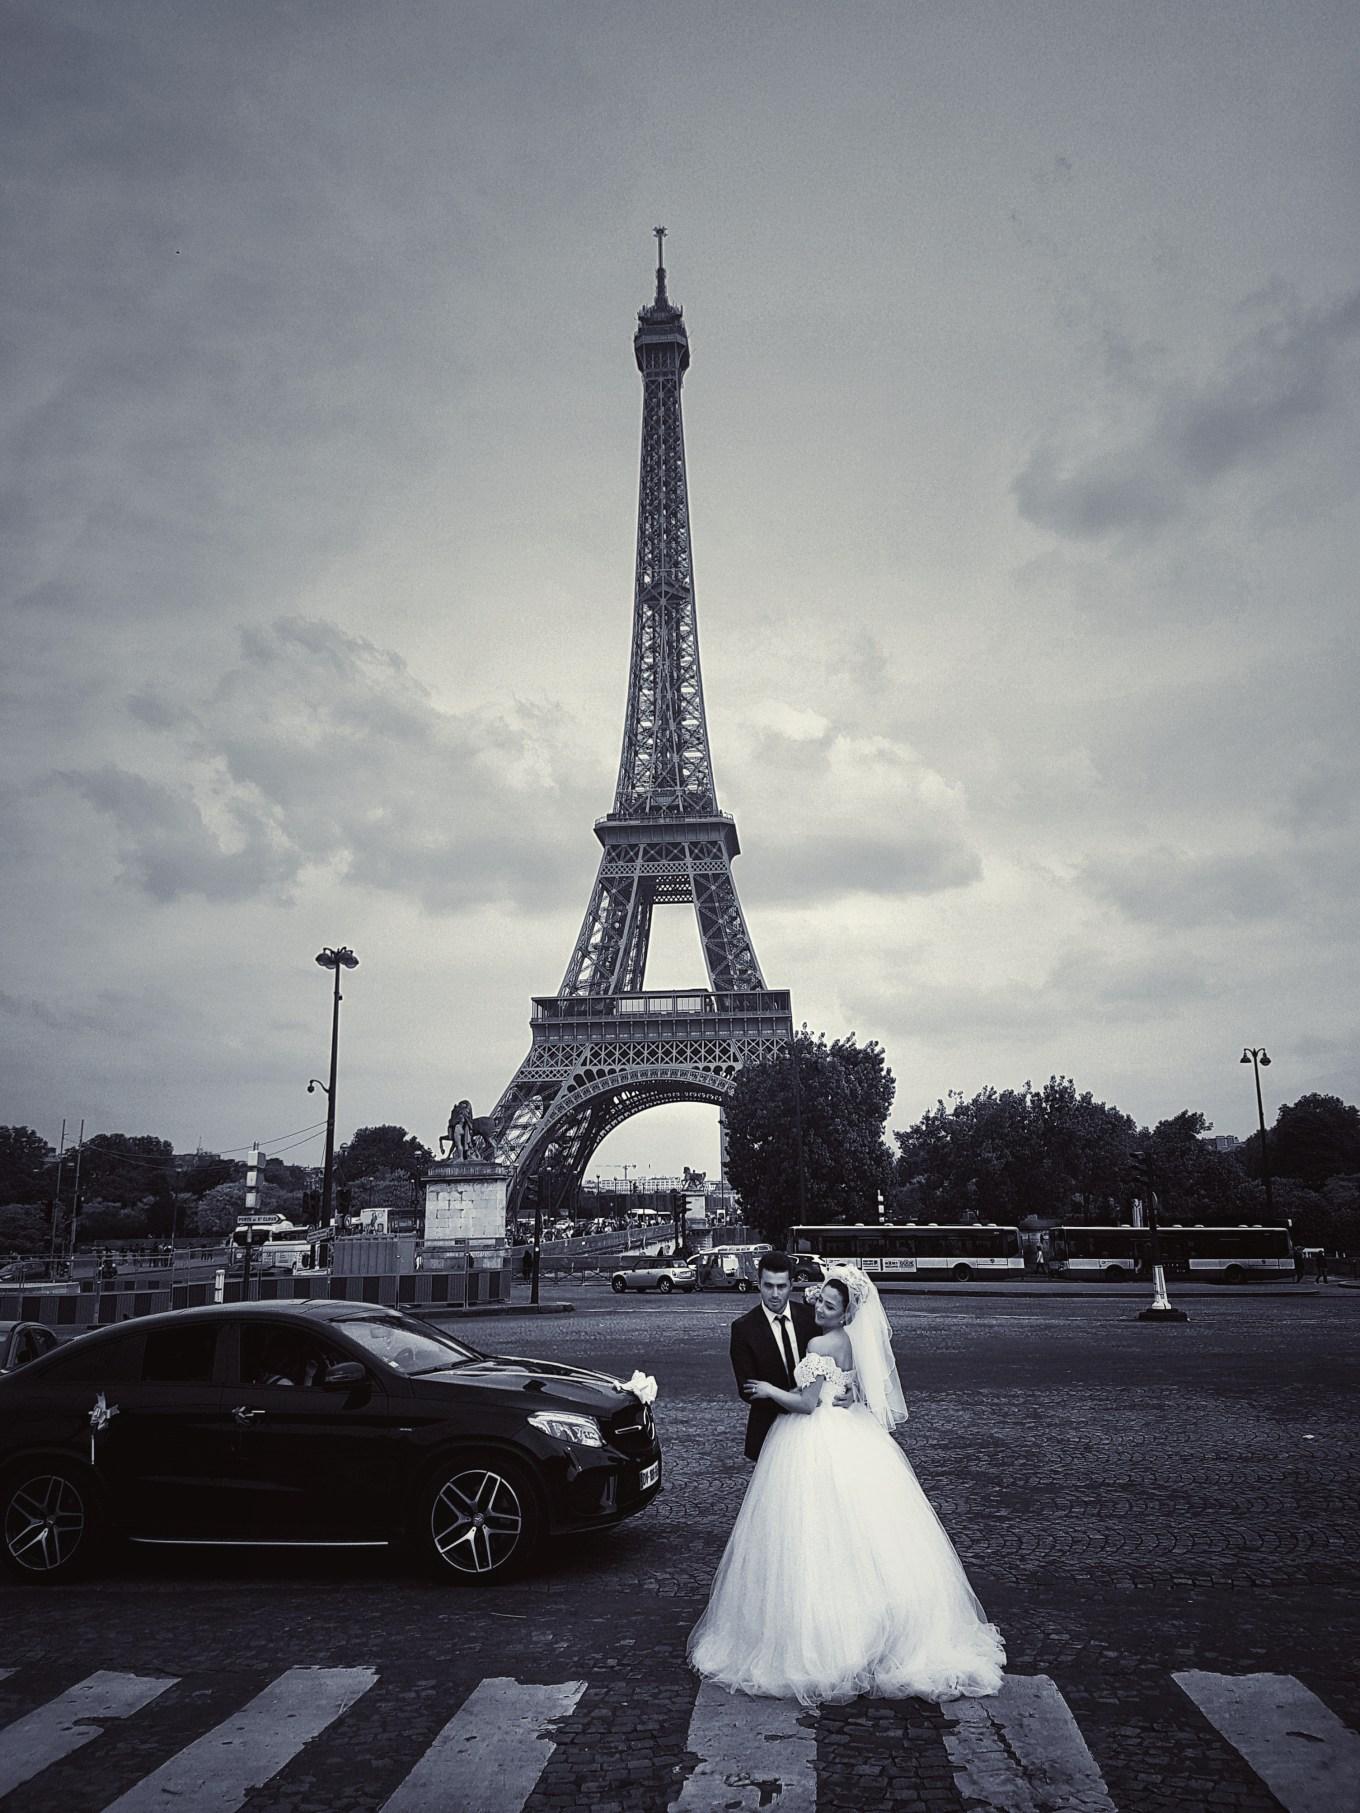 Paris Street Photography, Paris Photography, Kivanc Turkalp Paris.